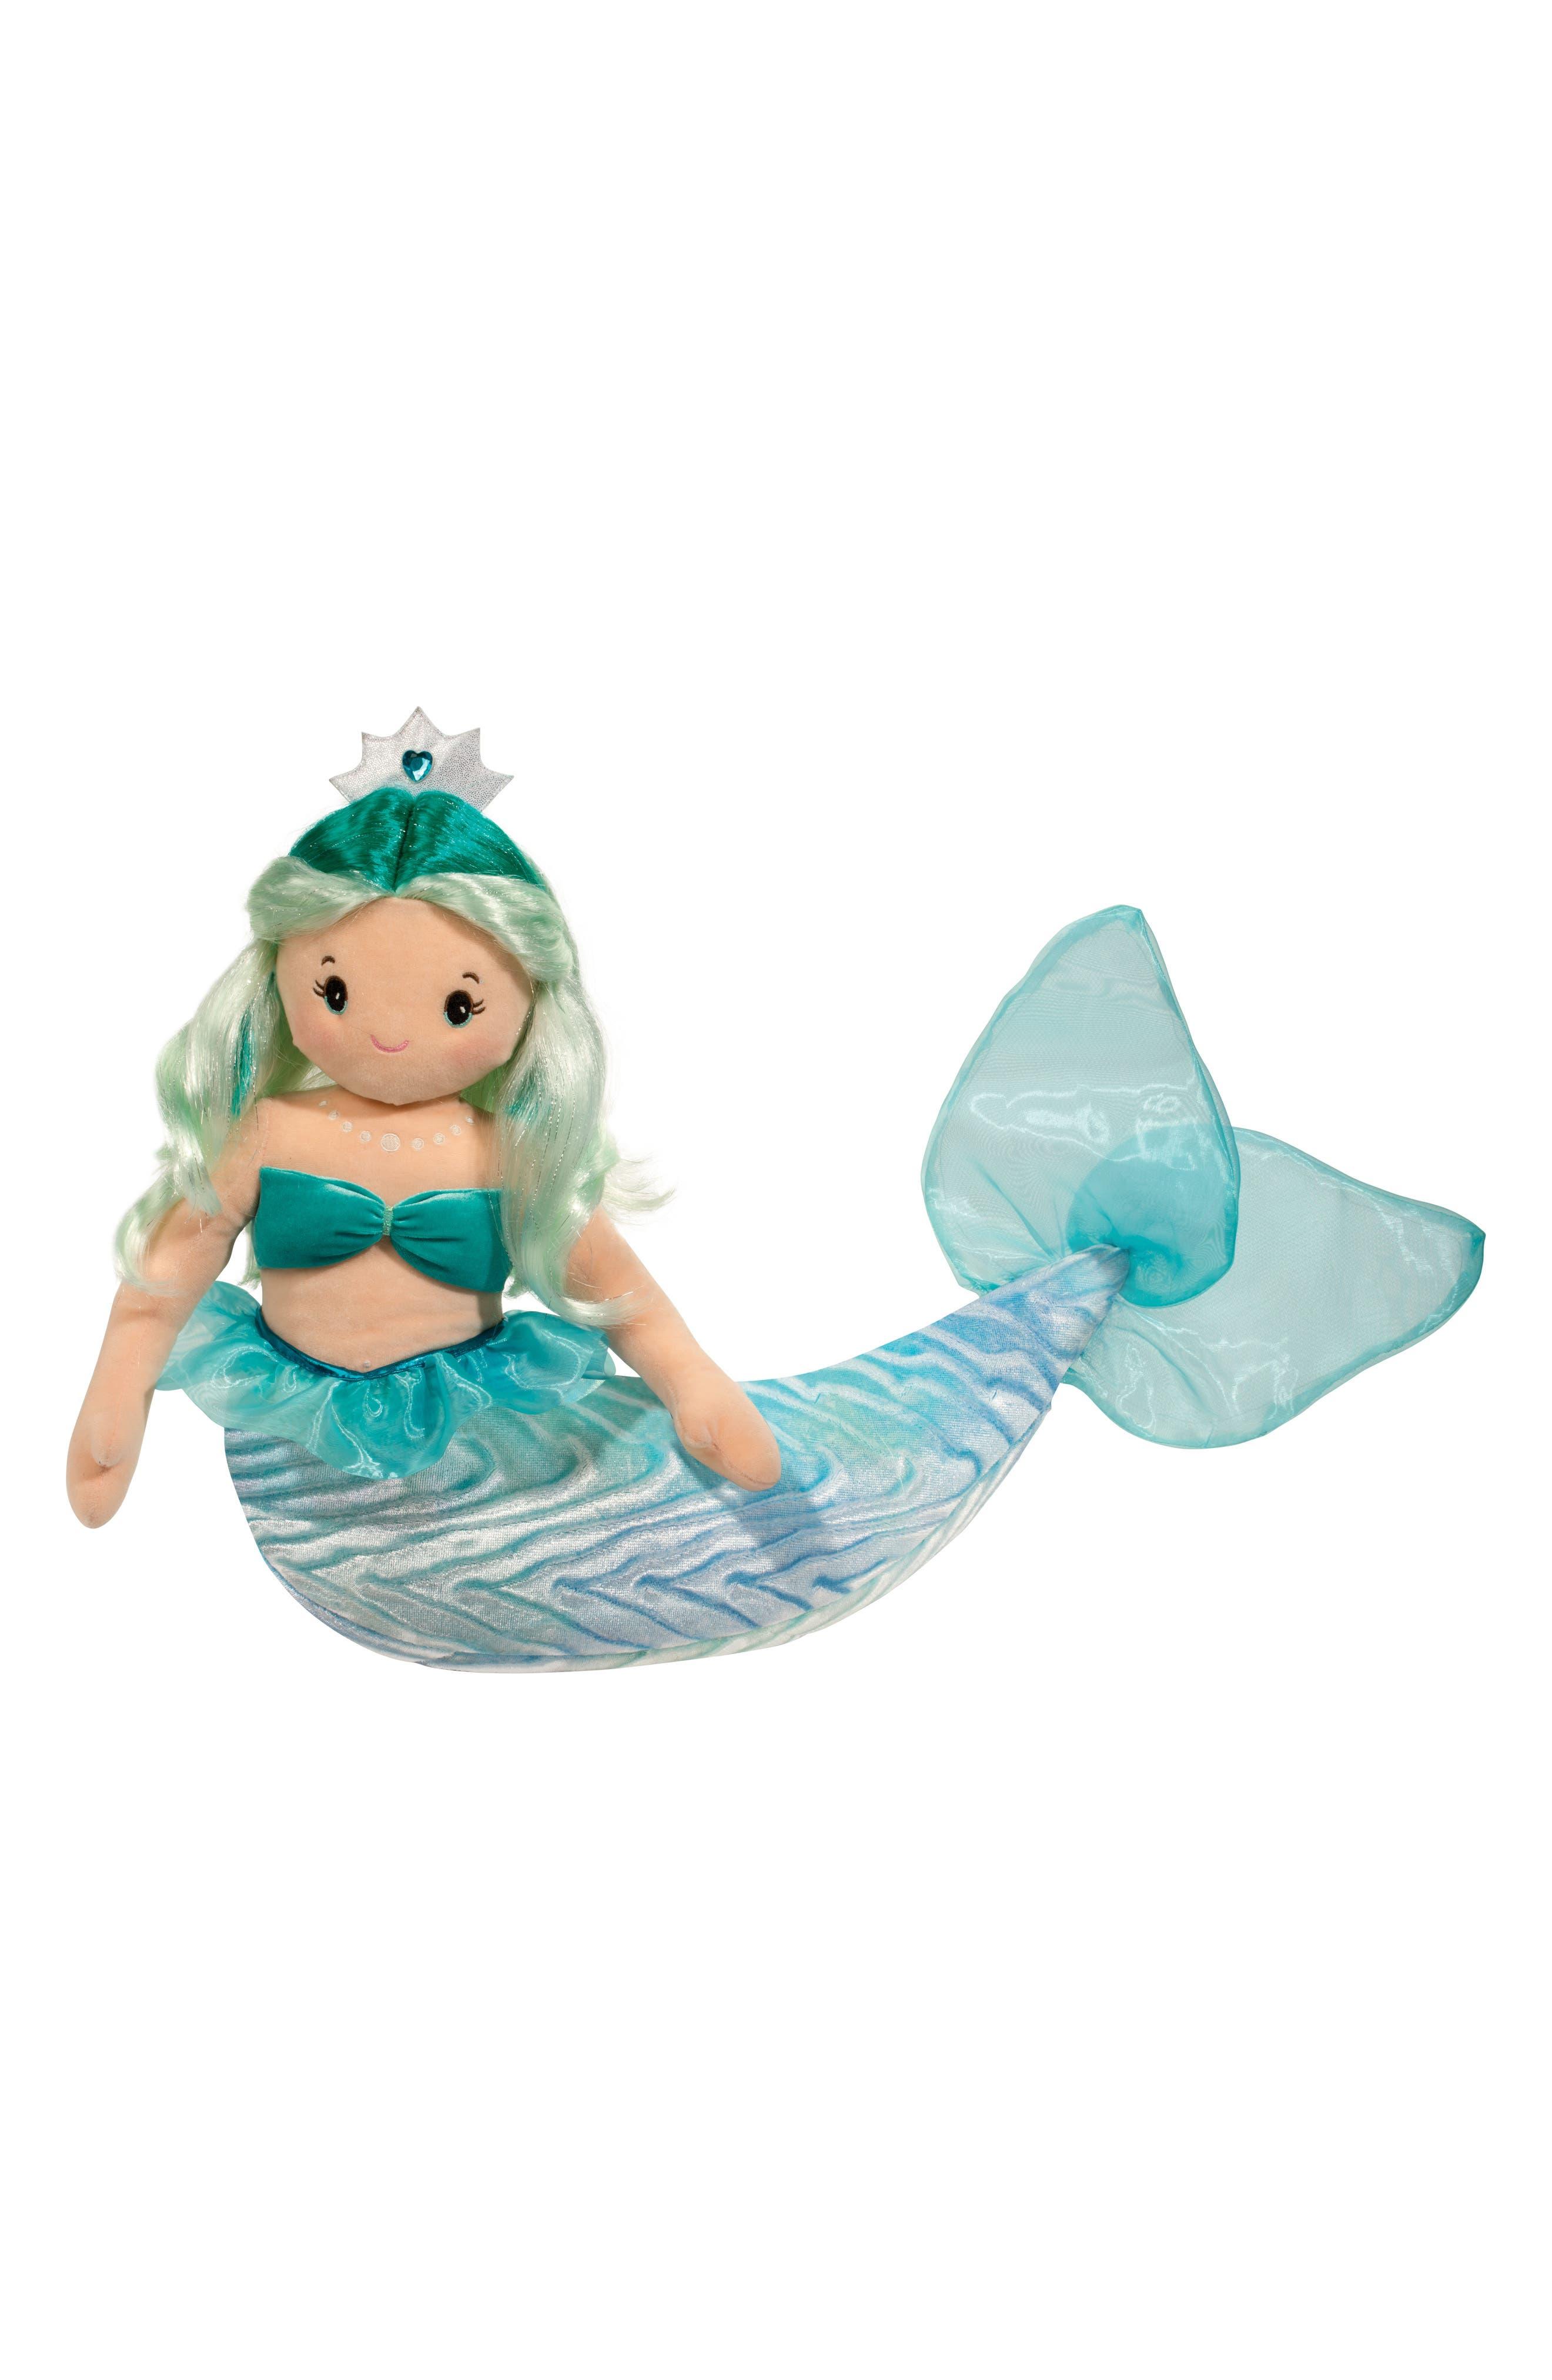 Douglas Ciara - Extra Large Aqua Mermaid Doll